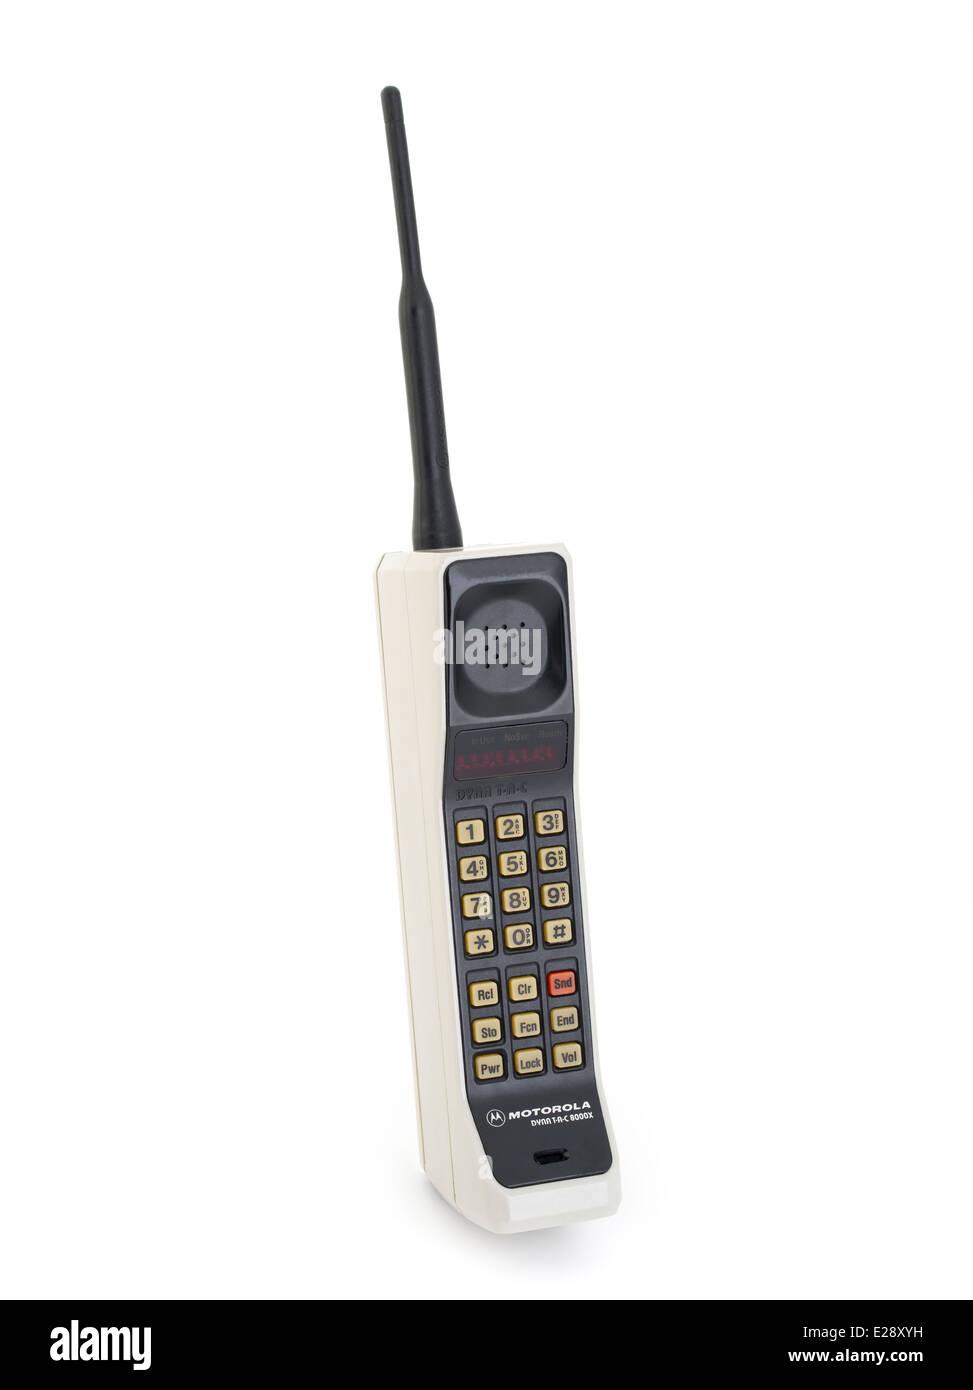 motorola 8000x. stock photo - vintage motorola dynatac 8000x produced in 1984 first mobile cellular phone